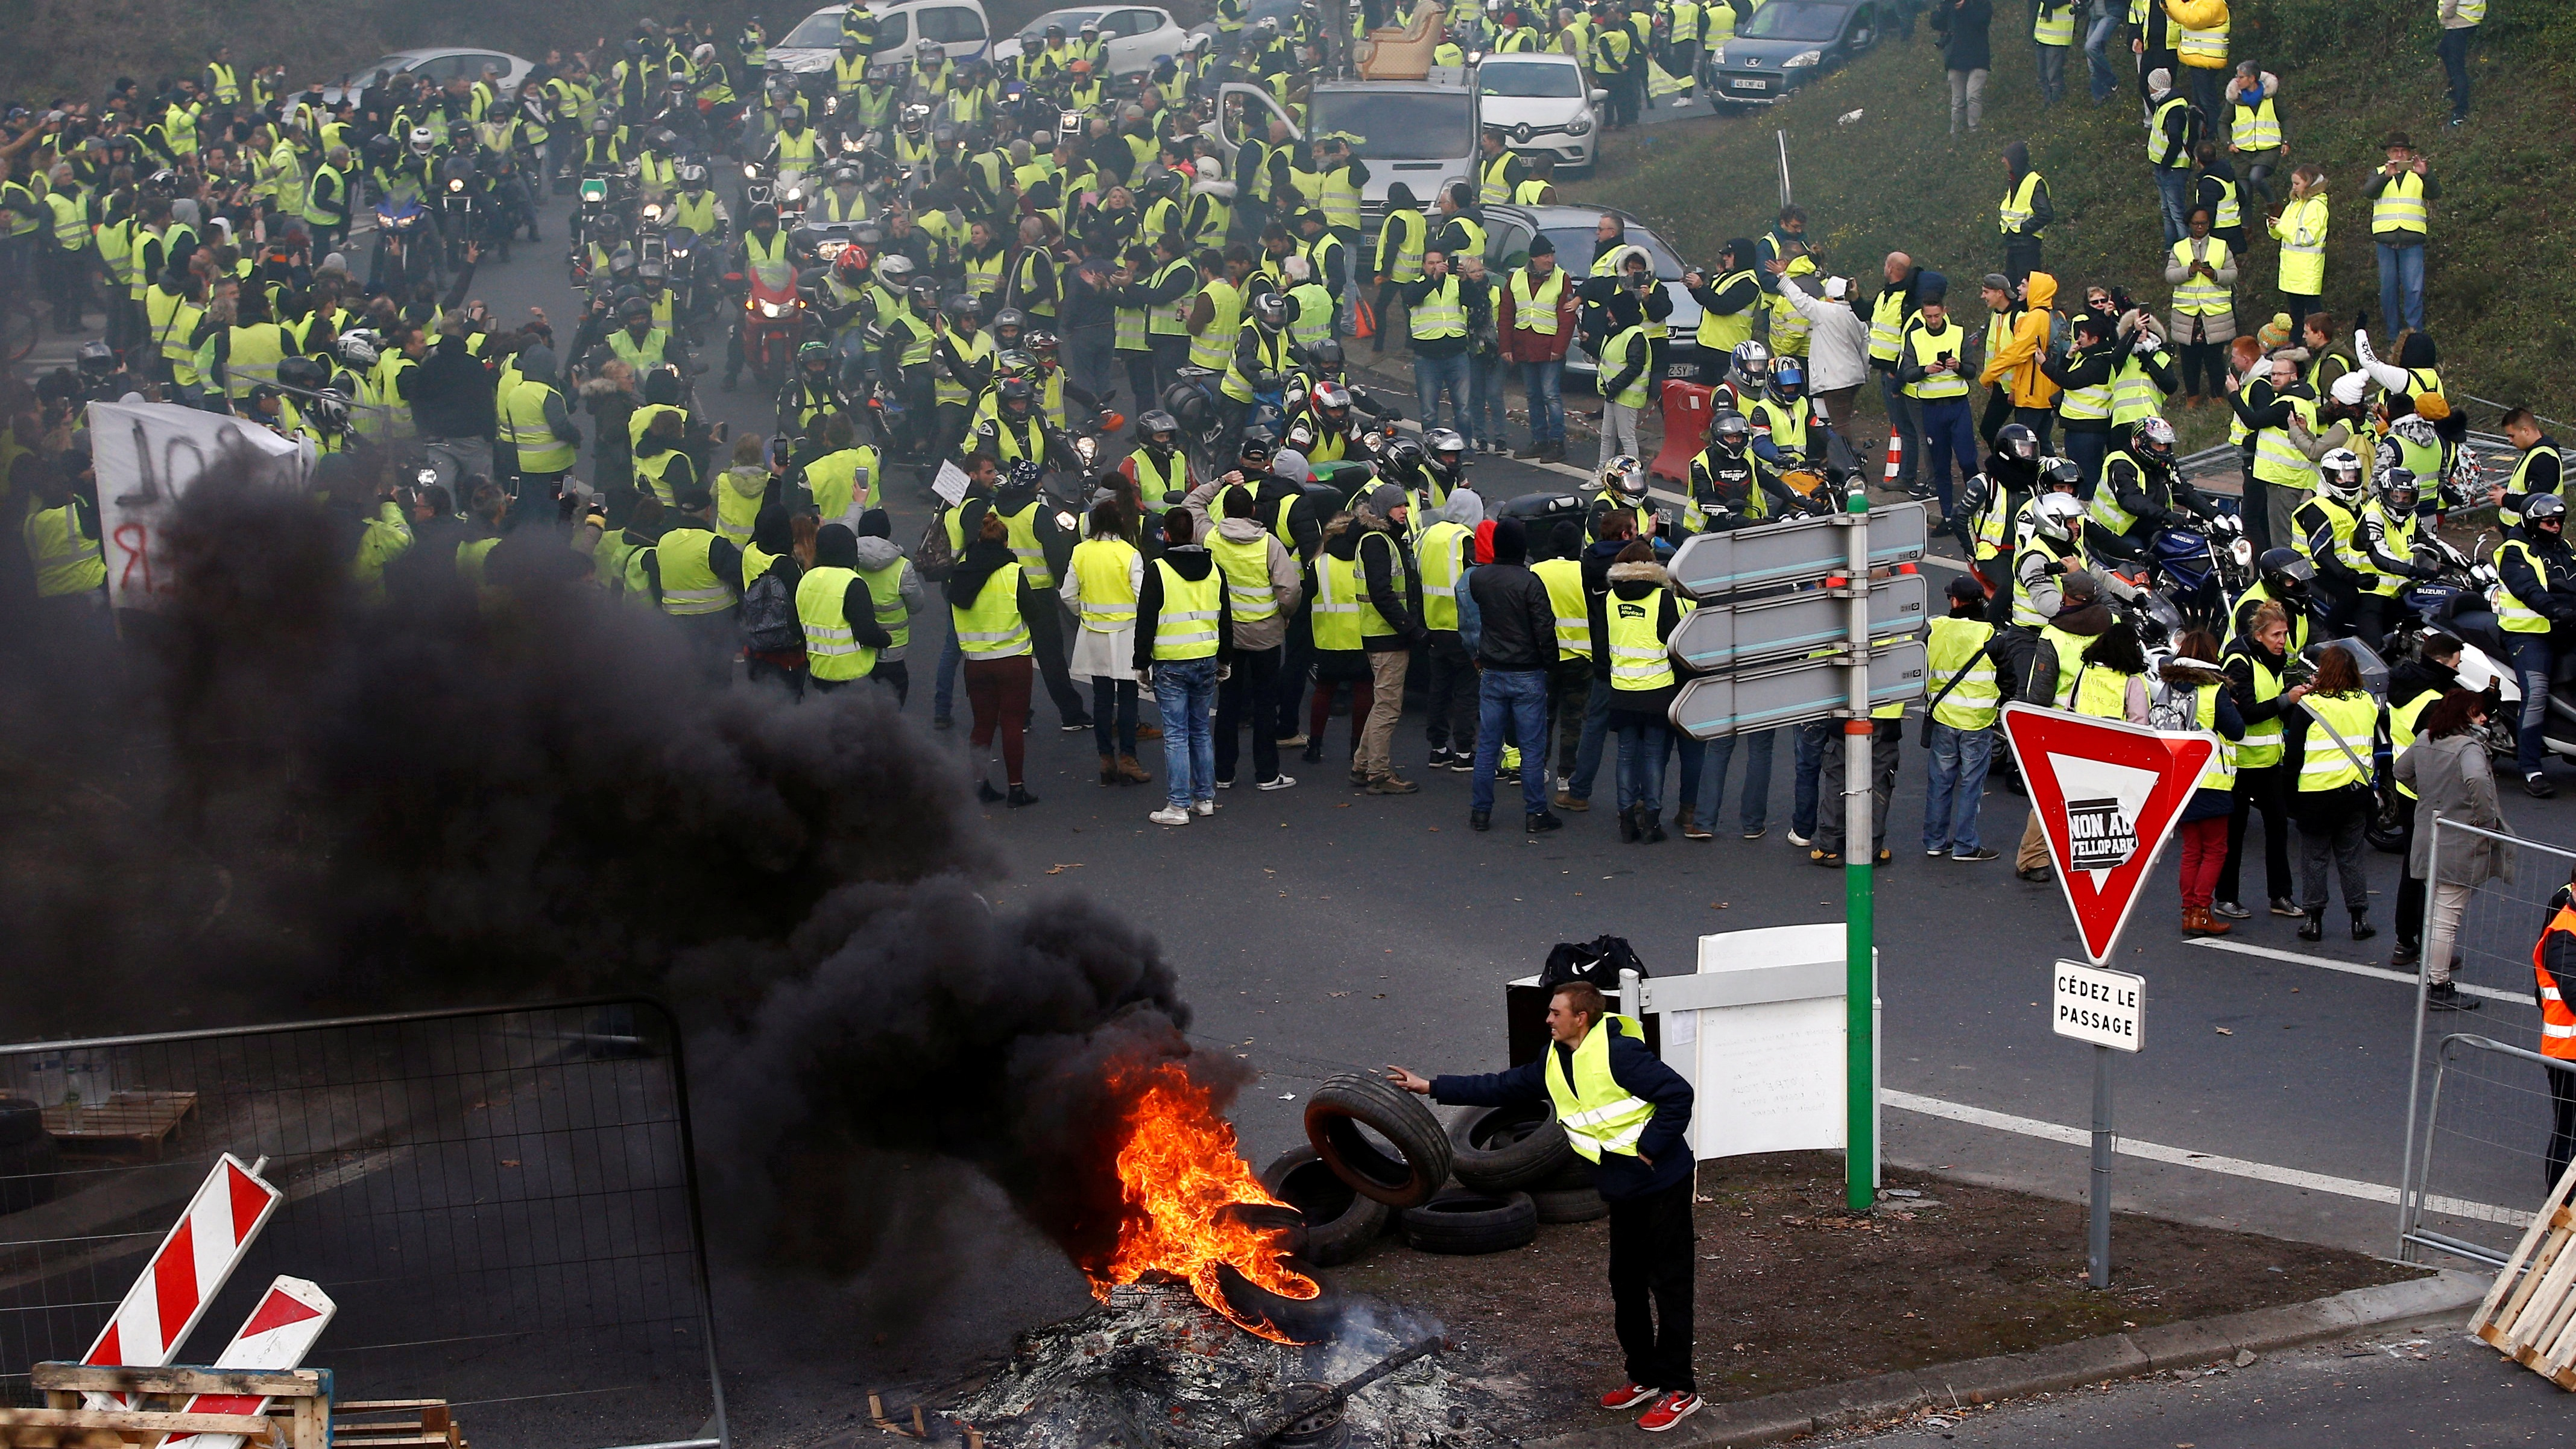 En medio de protestas, Francia posterga 'gasolinazo' por 6 meses